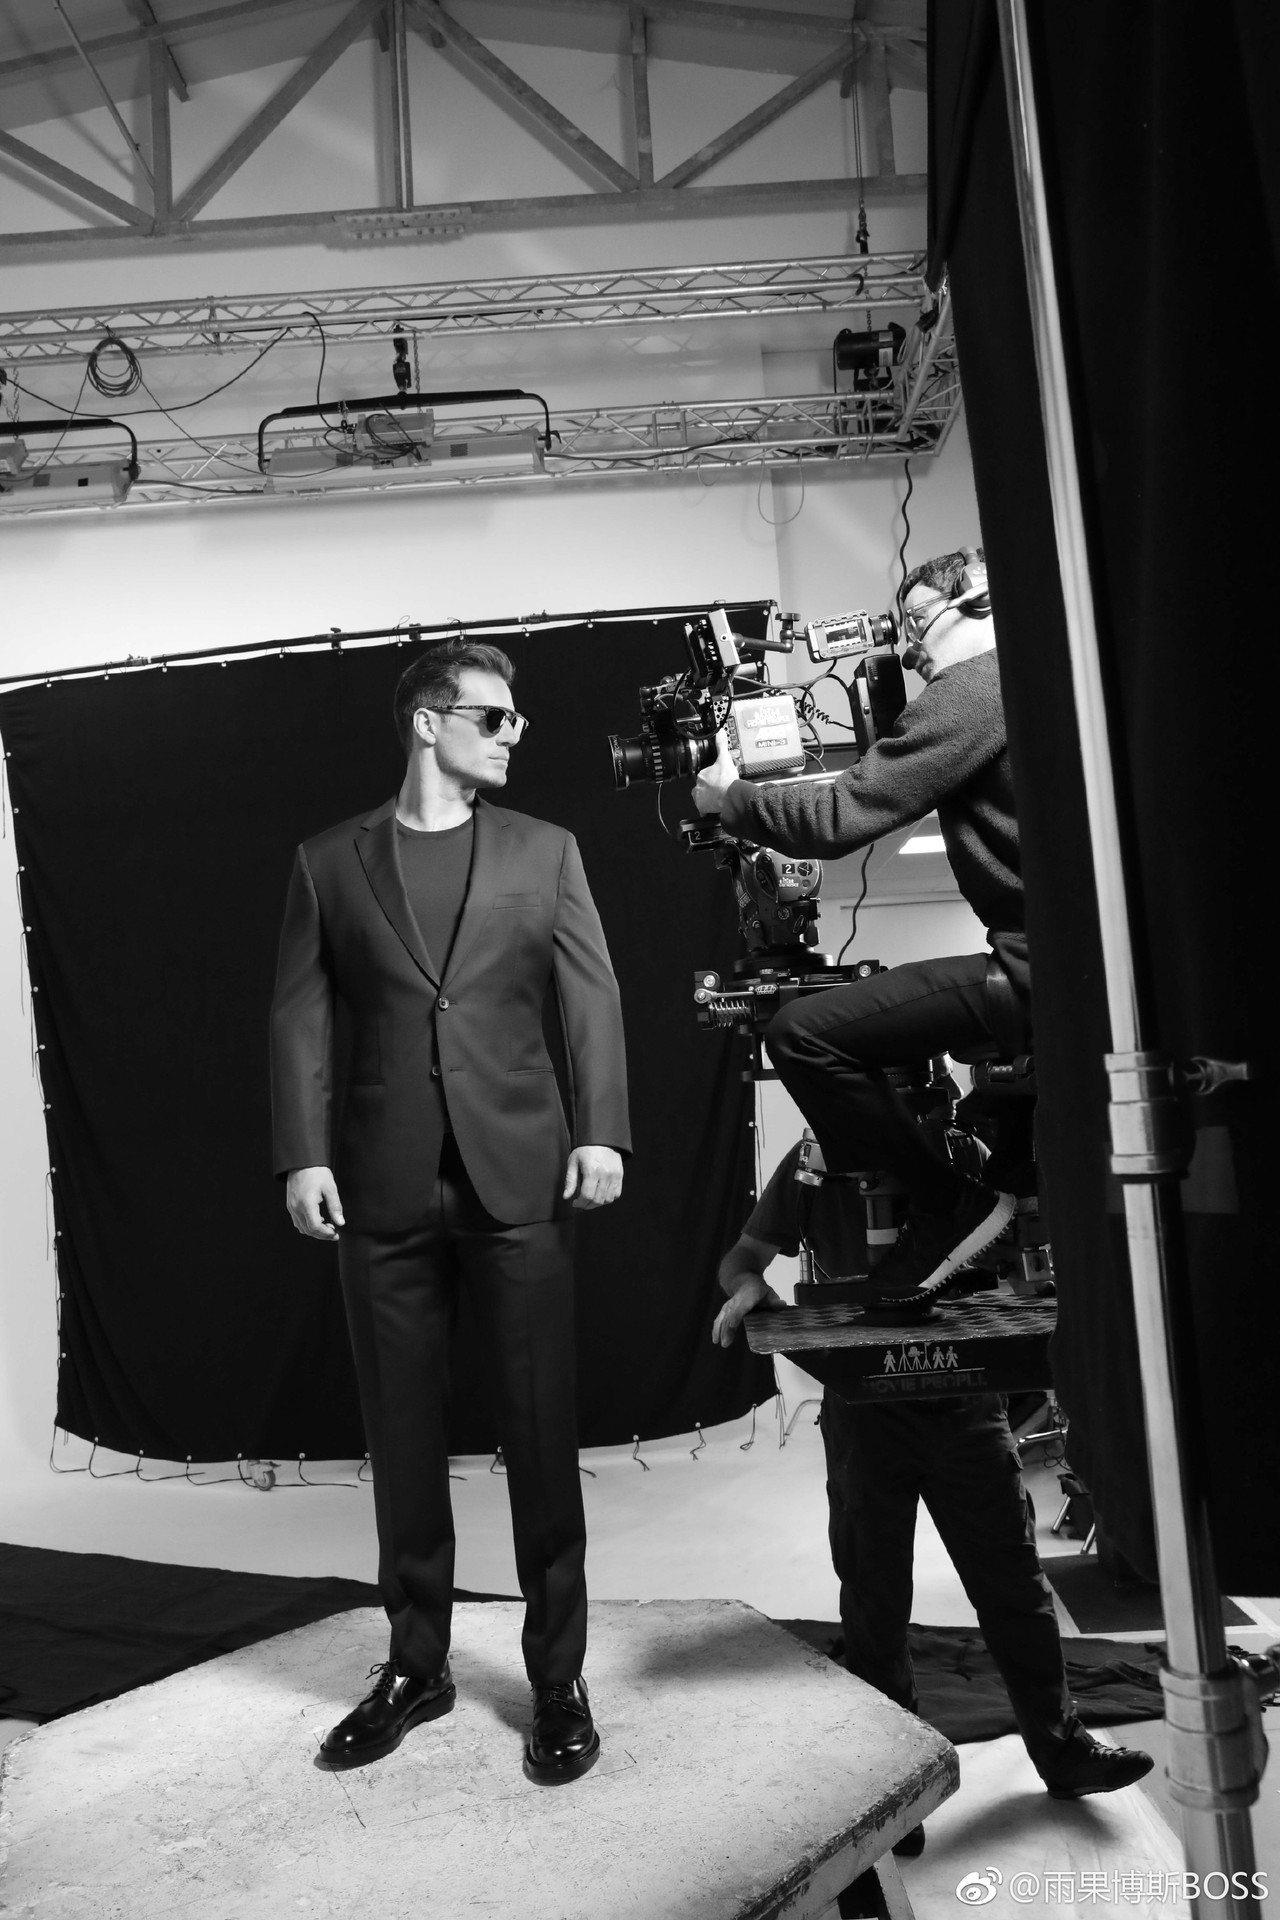 Hugo Boss這系列廣告由攝影師Paul Wetherell掌鏡拍攝,希望透...